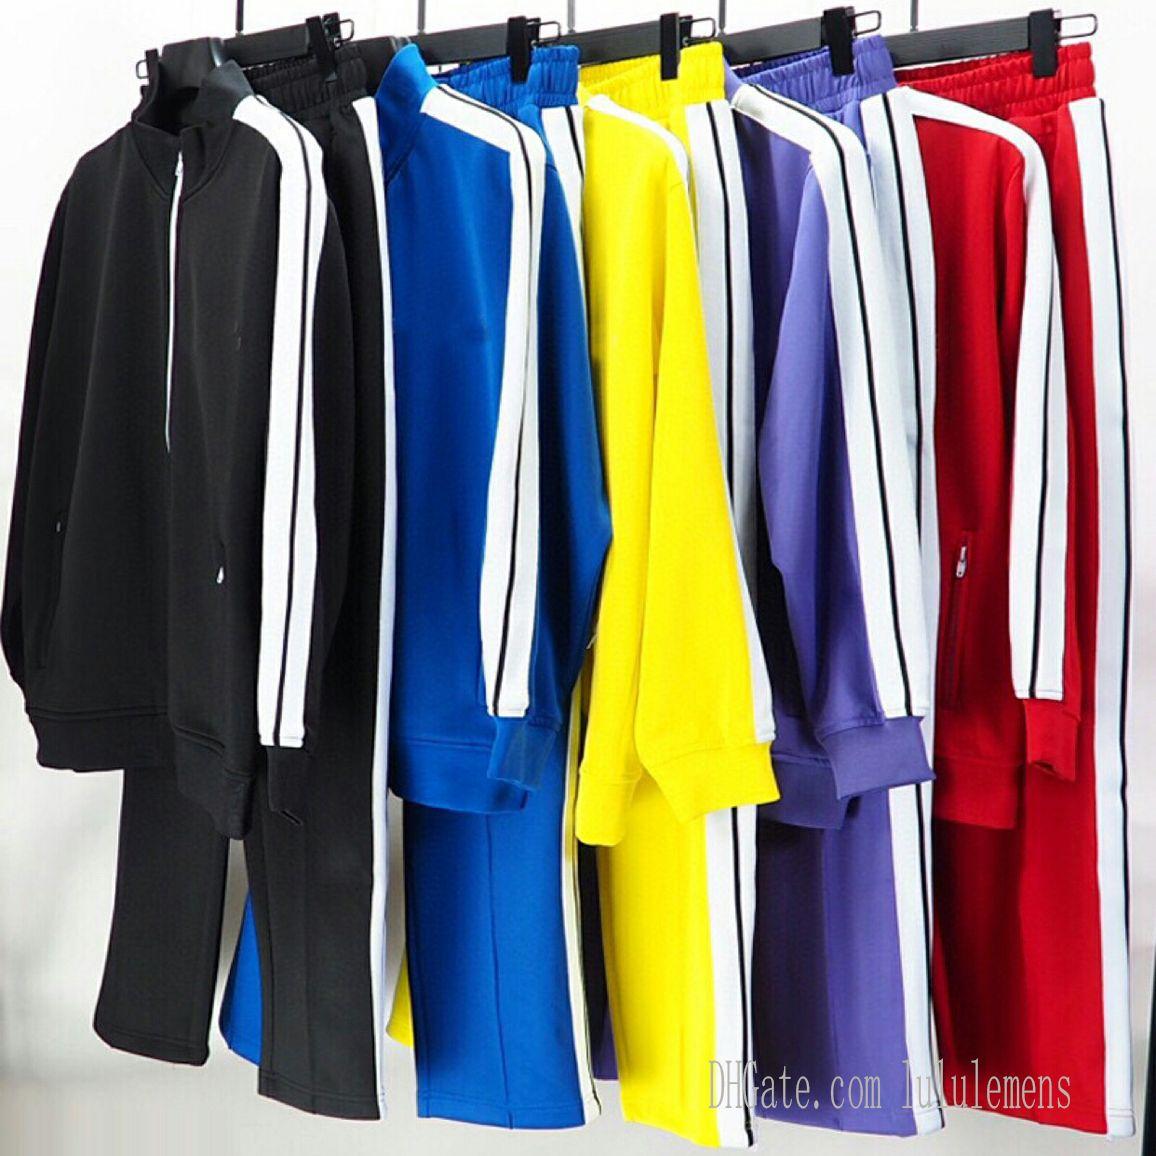 [CODE:OCTEU03]Hommes Womens Tracksuits Sweatshirts Convient aux hommes Track Sweat Costume Manteaux Angels Angles Homme Designers Vestes Hoodies Pantalons Sportswear 21SS Palm 0101